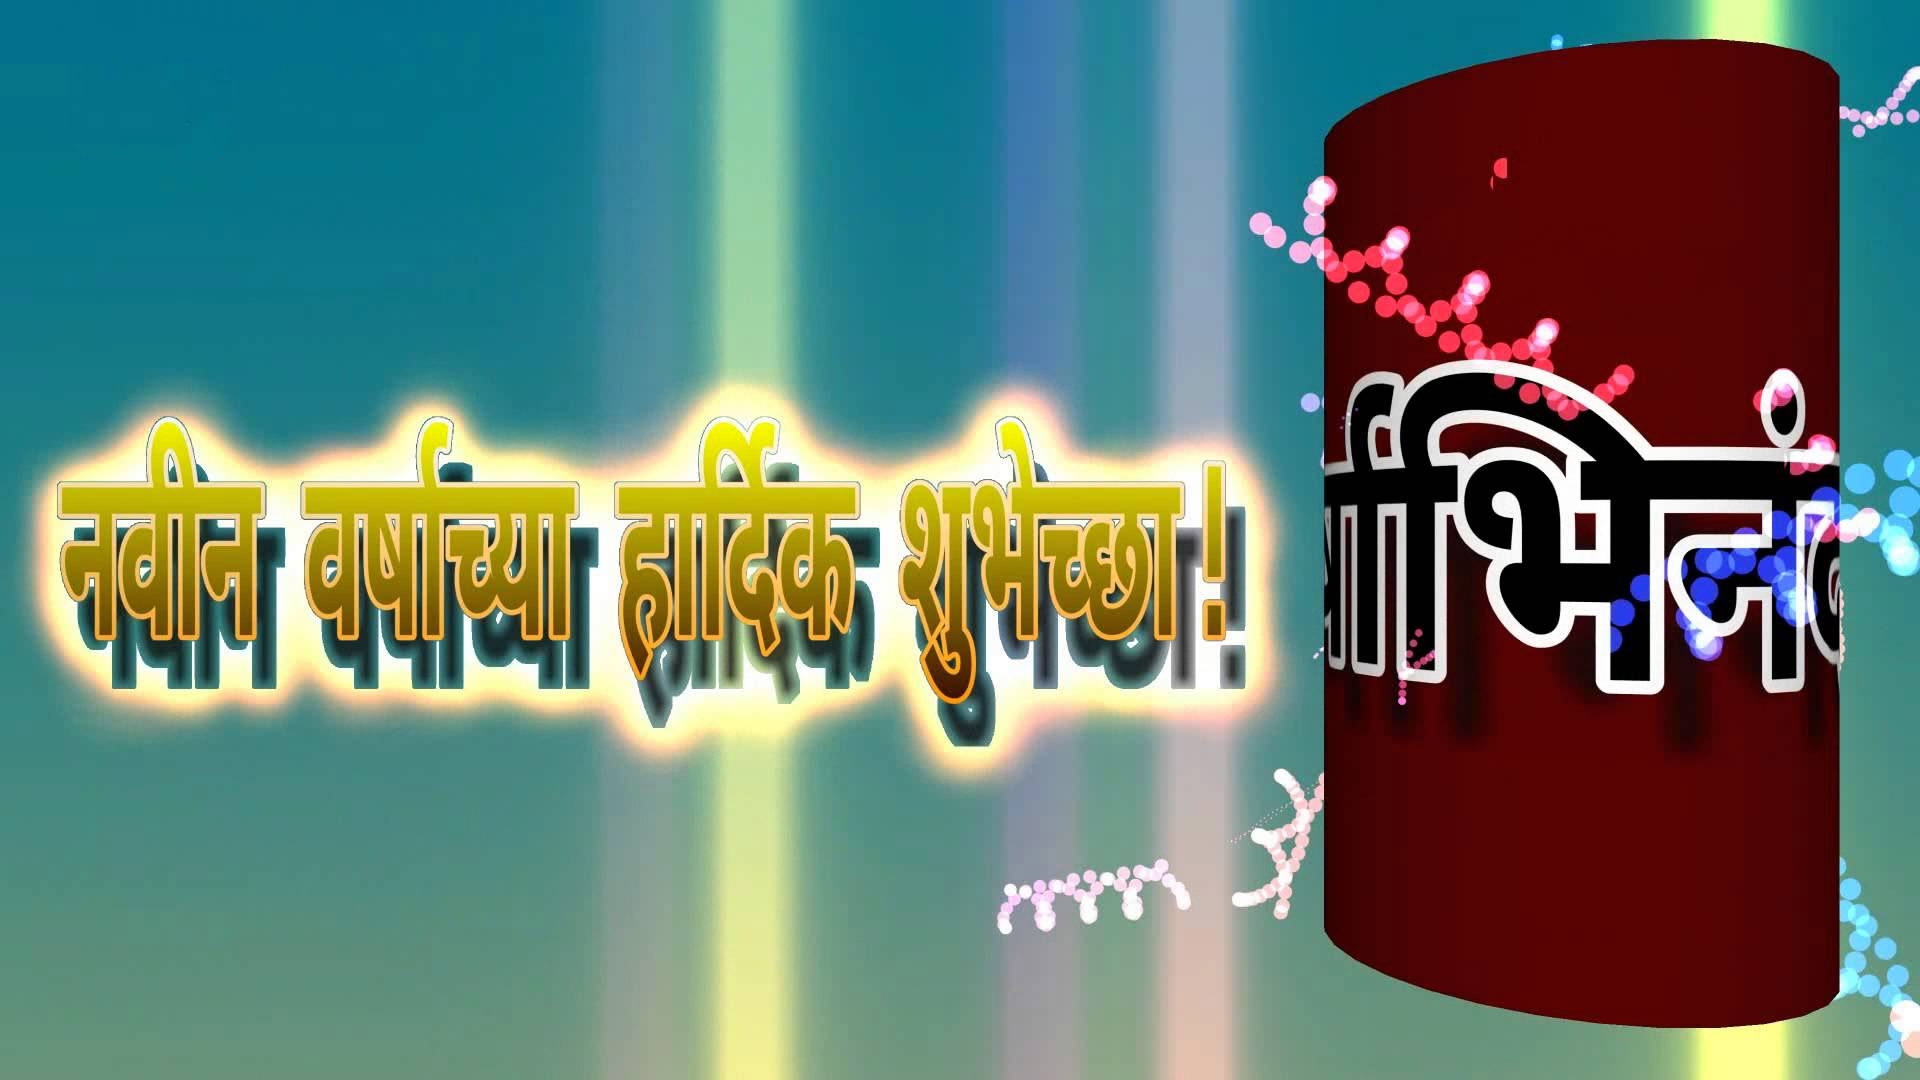 Hindu Nav Varsh Happy New Years Wallpapers Image Photos India In Hindi